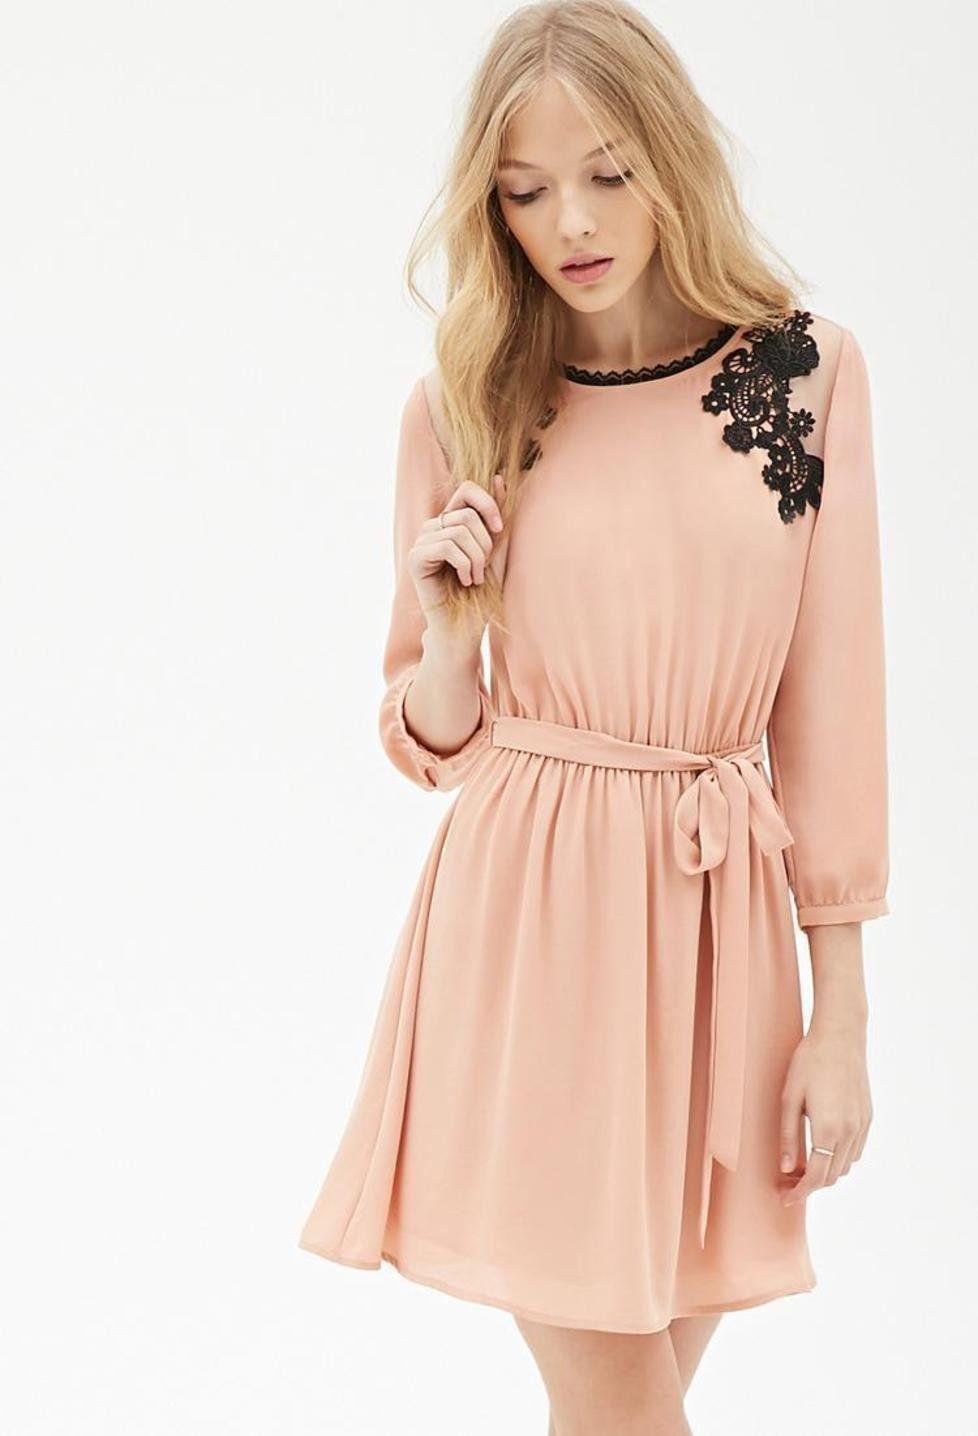 Crochet Embroidered Chiffon Dress Http Picvpic Women Dresses Forever21 Blush Ref Qa8lwa